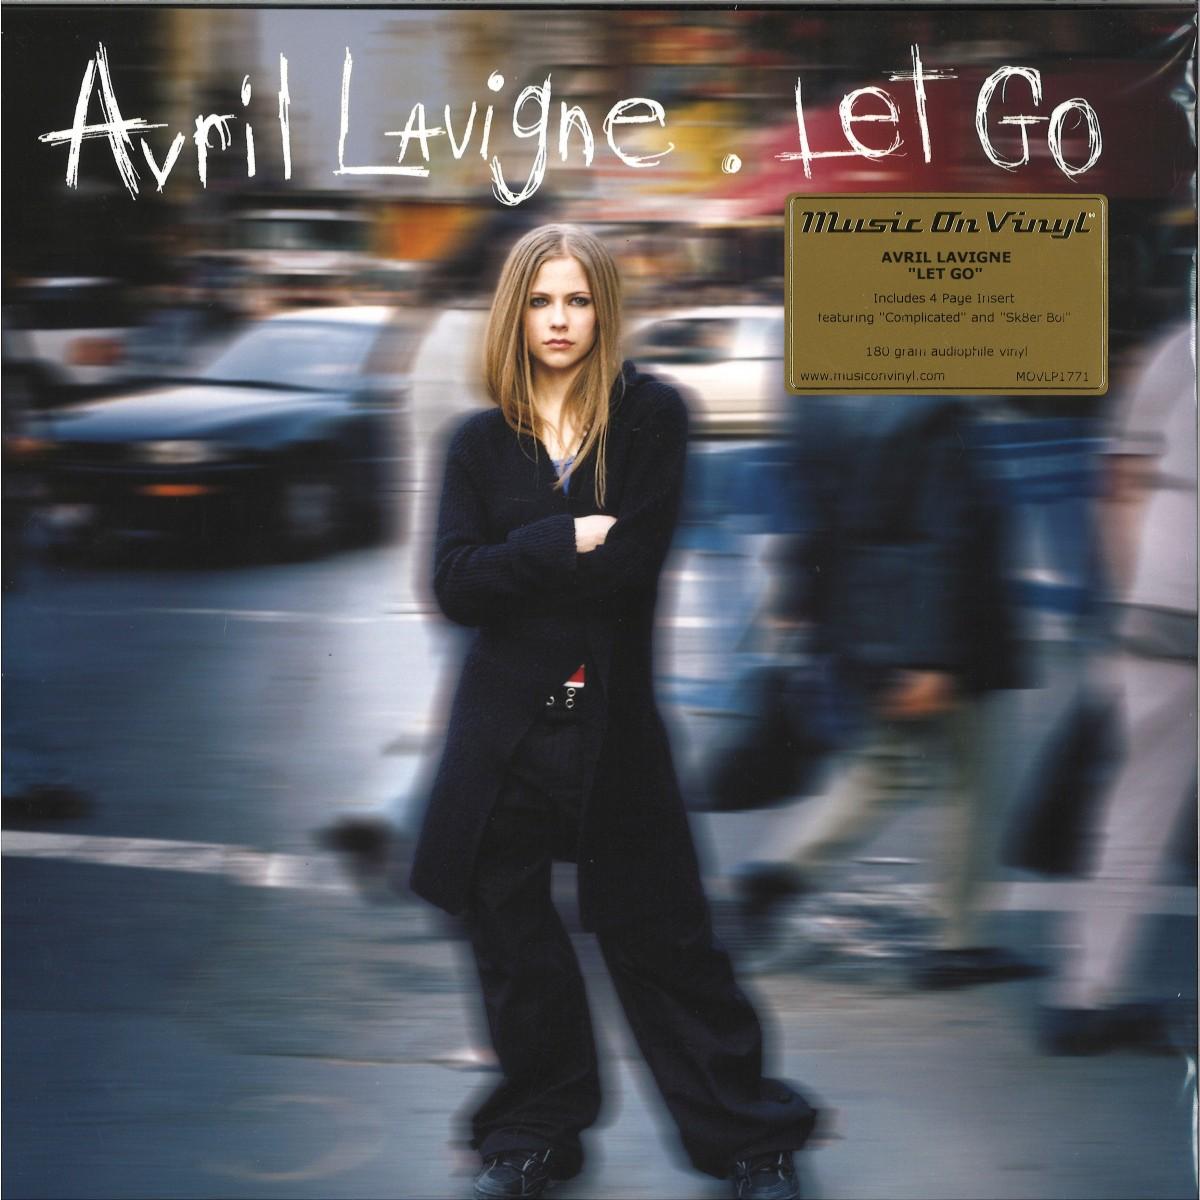 Avril Lavigne - Let Go - Avril Lavigne Discography MP3